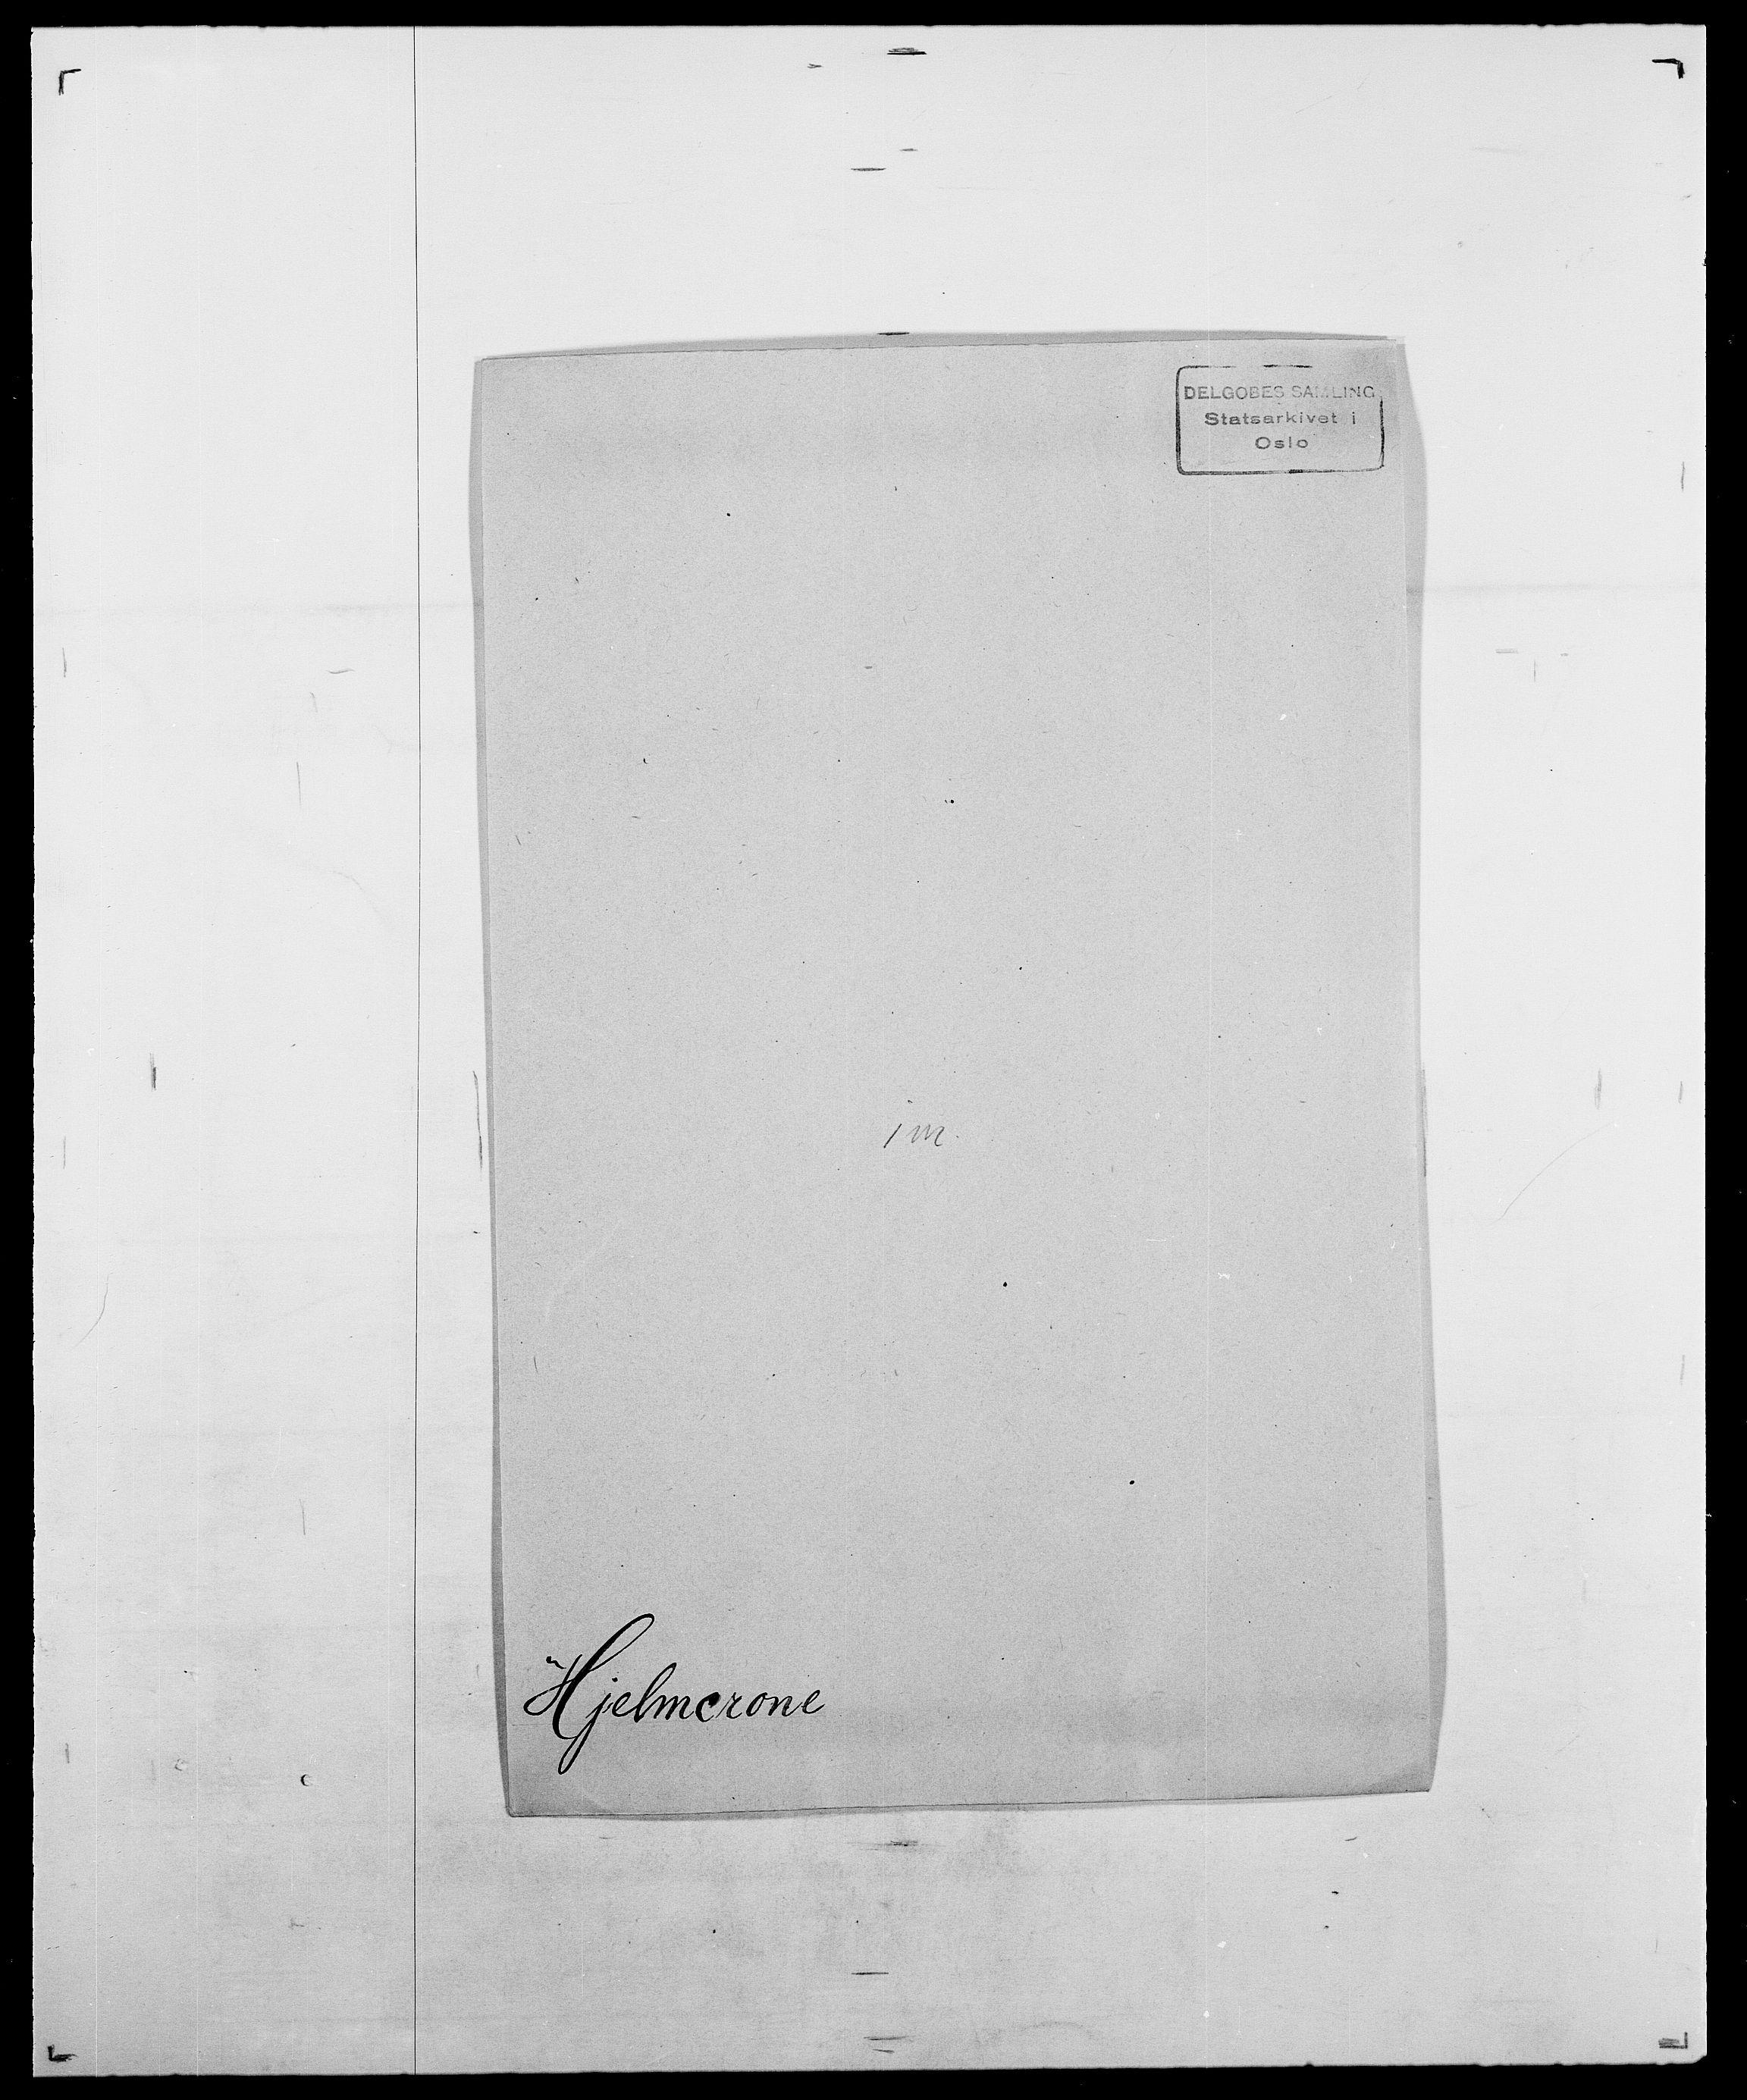 SAO, Delgobe, Charles Antoine - samling, D/Da/L0017: Helander - Hjørne, s. 537